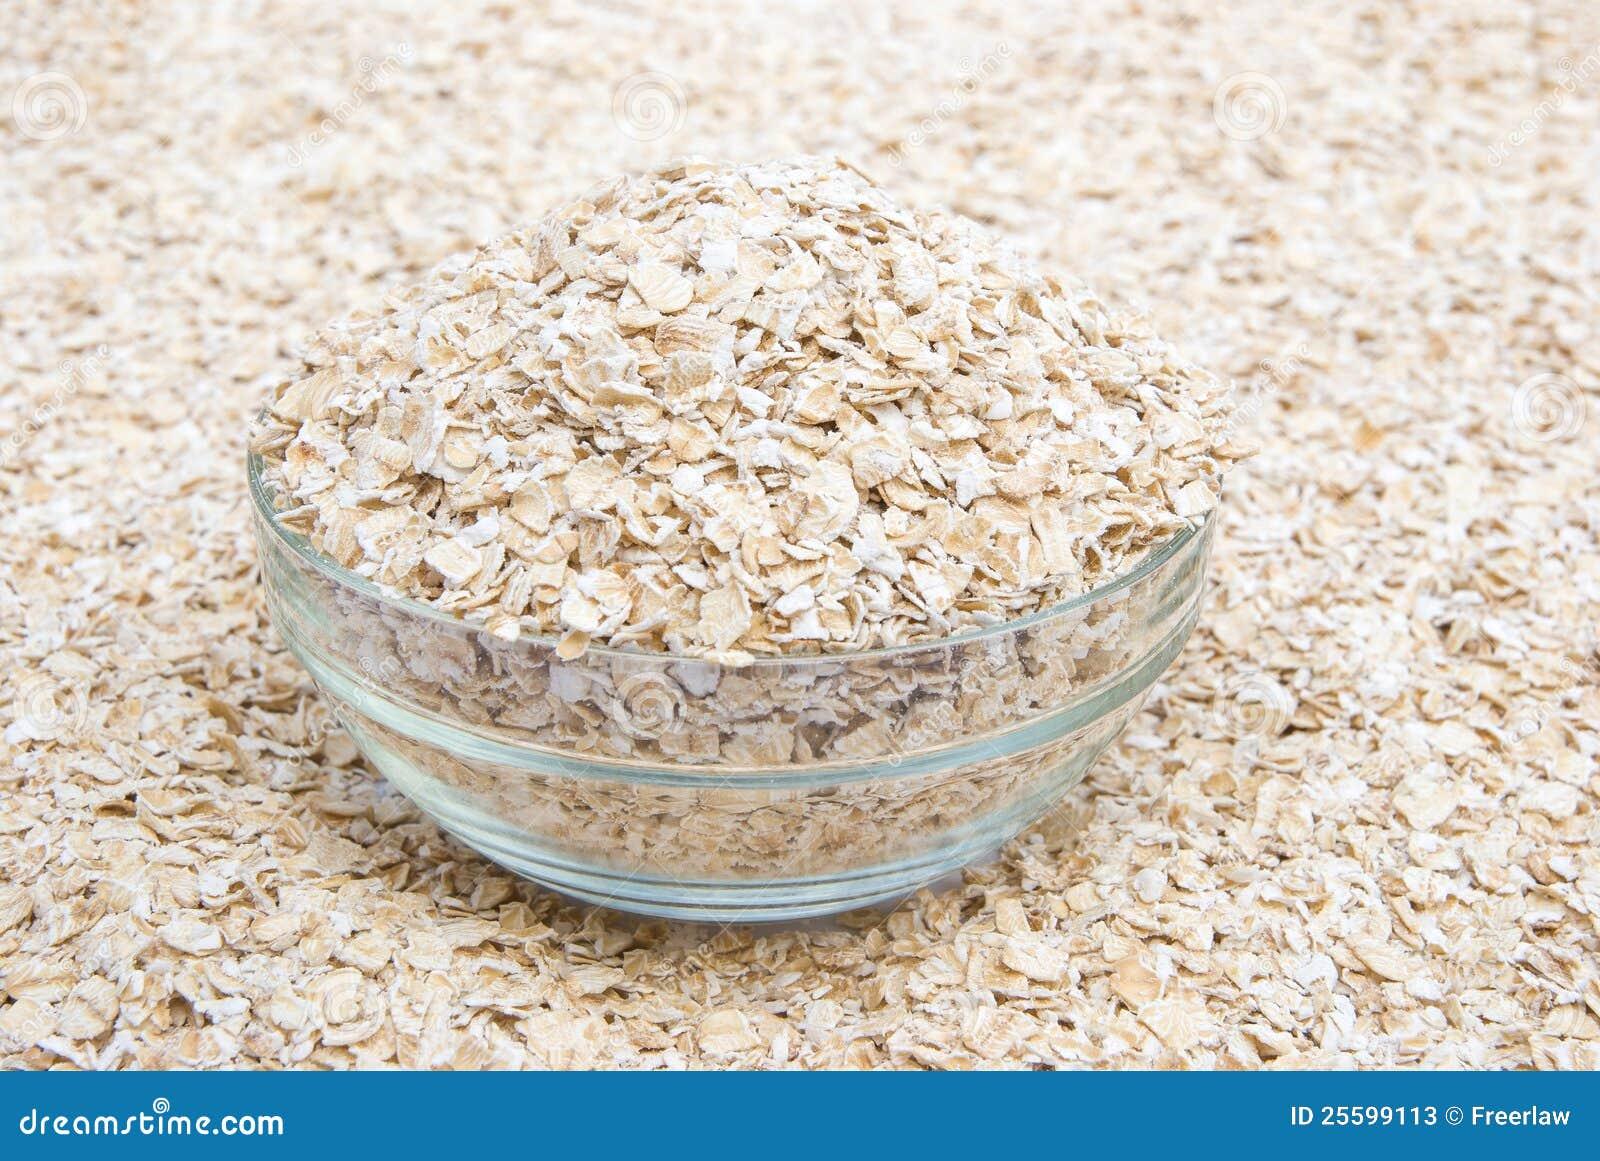 Harina de avena cruda imagen de archivo imagen de oatmeal - Cocinar harina de avena ...